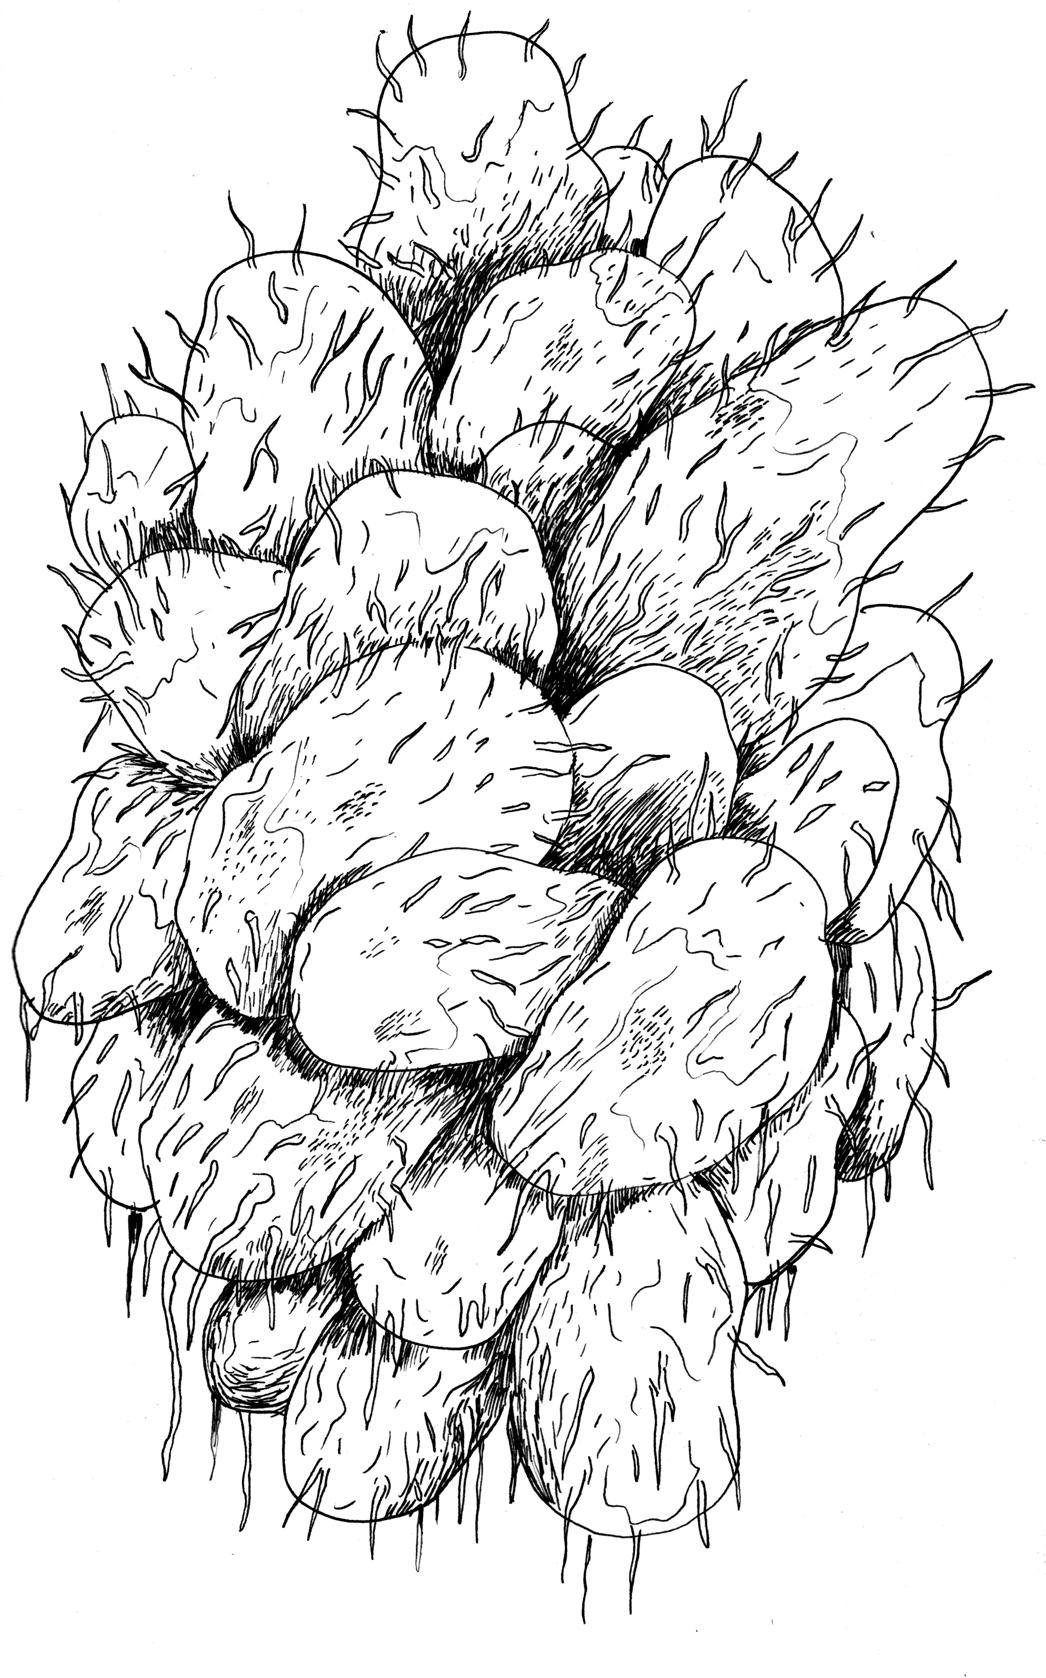 kartoffel.jpeg